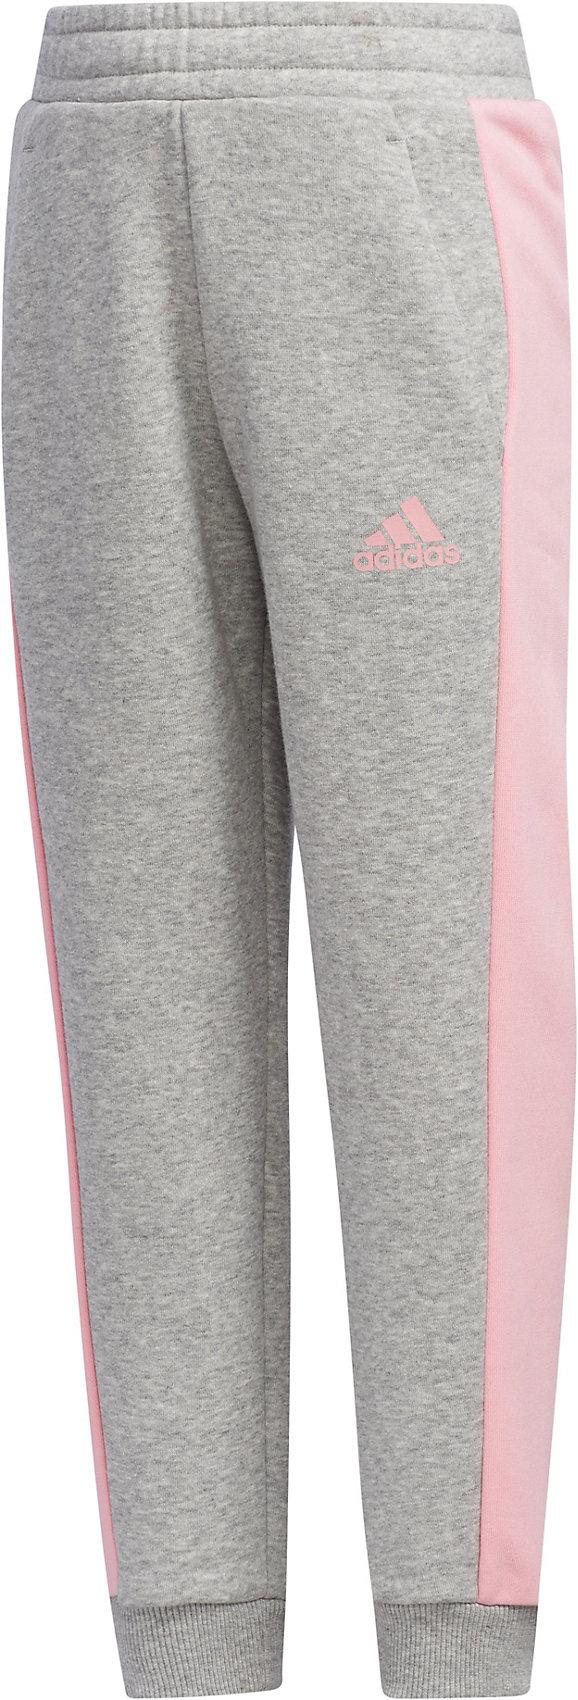 Details zu Neu adidas Performance Jogginganzug LK GFX HDY SET für Jungen 11159201